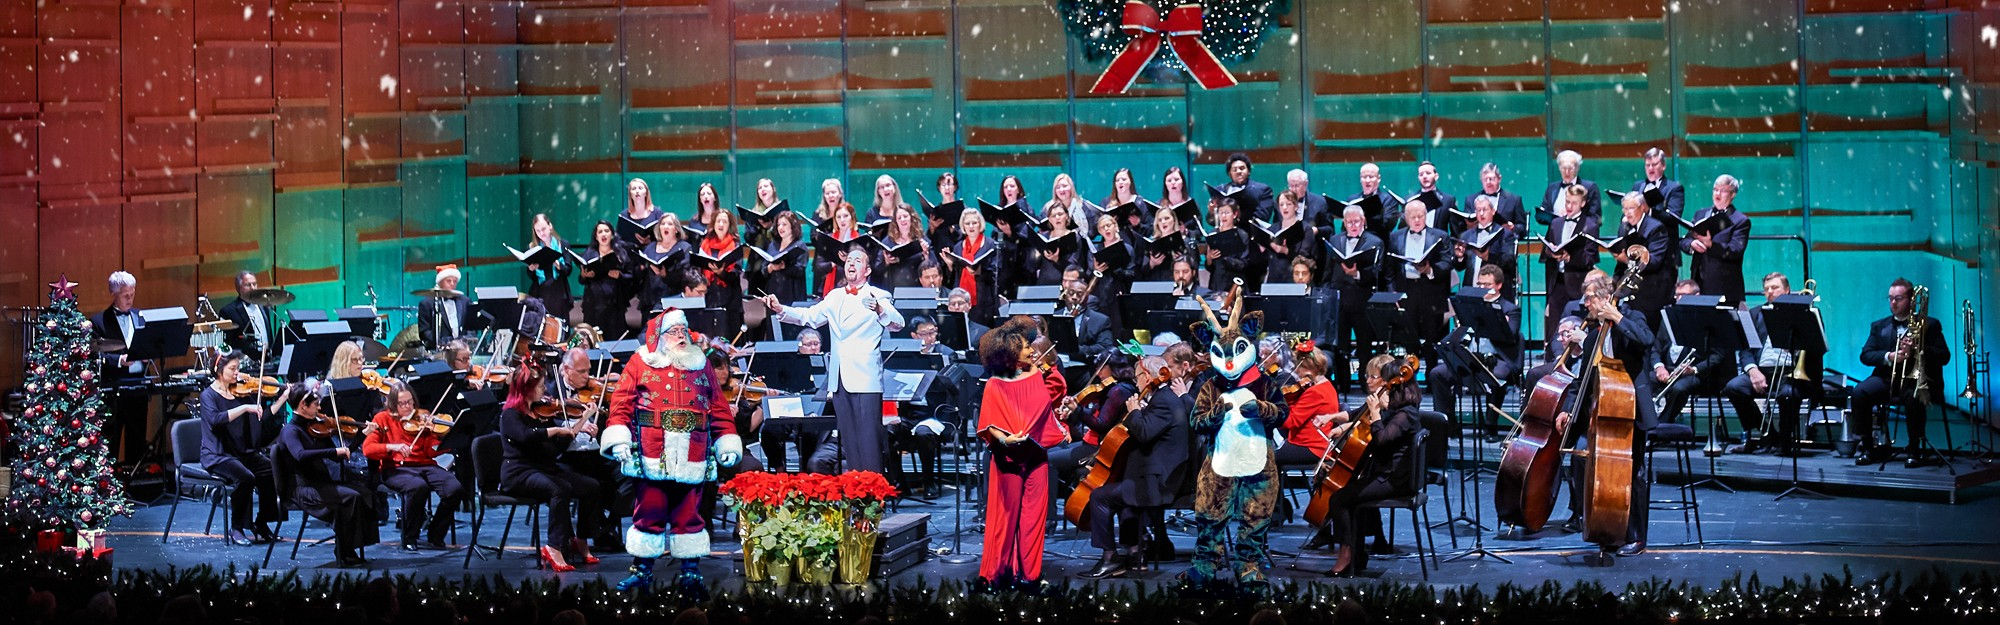 Magic of Christmas| Charlotte Symphony Orchestra